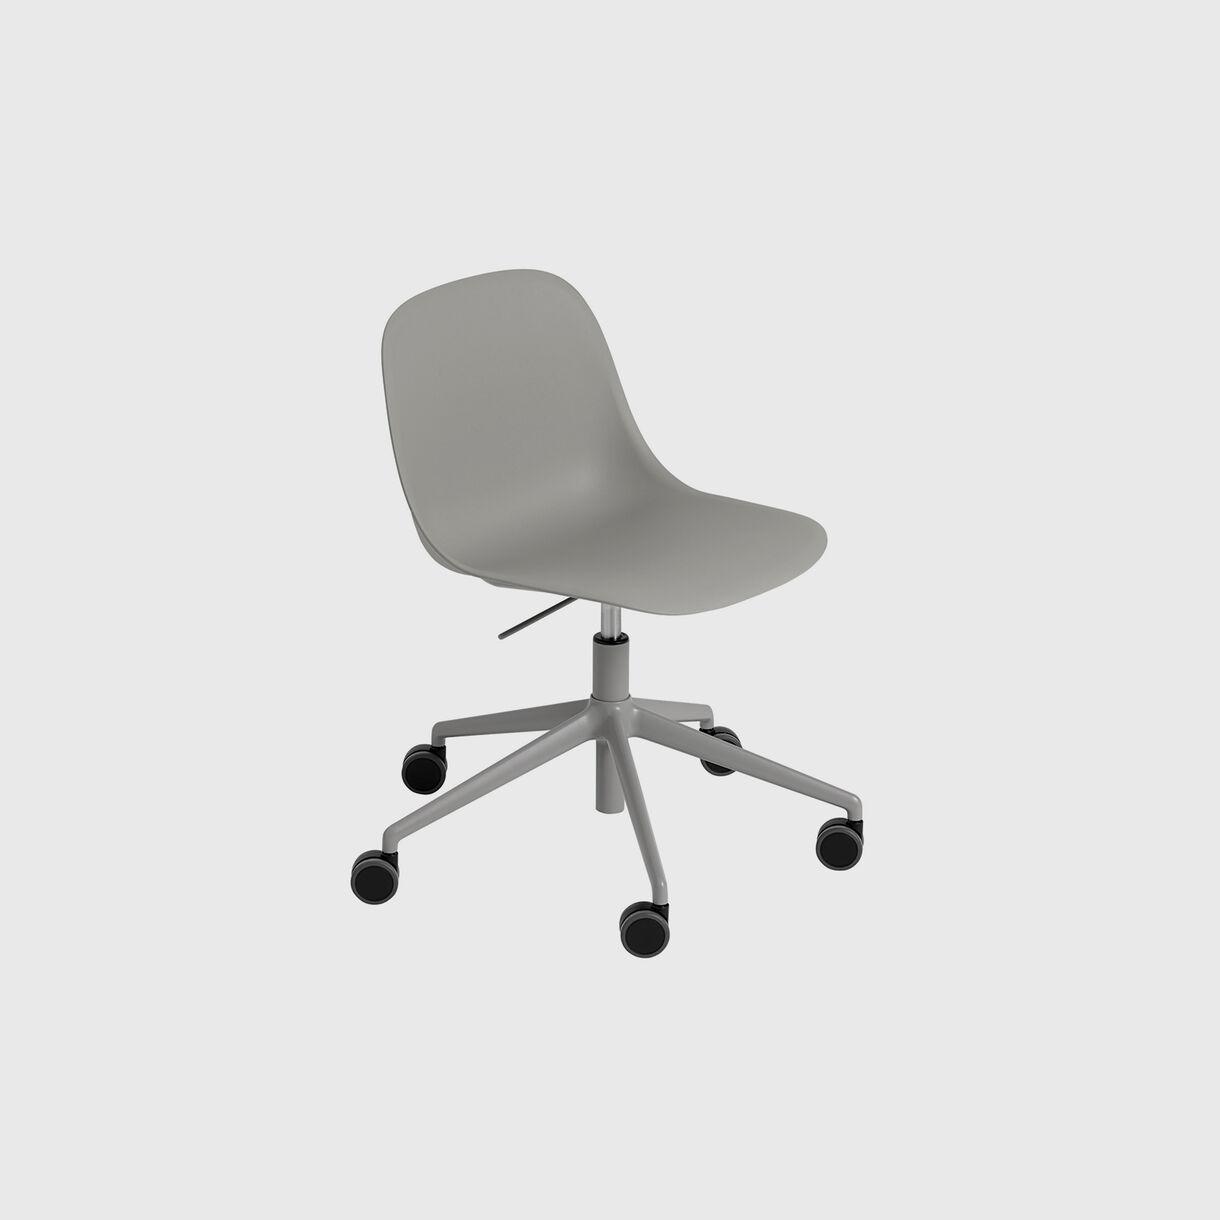 Fiber Side Chair, Swivel Base with Castors & Gas Lift, Grey